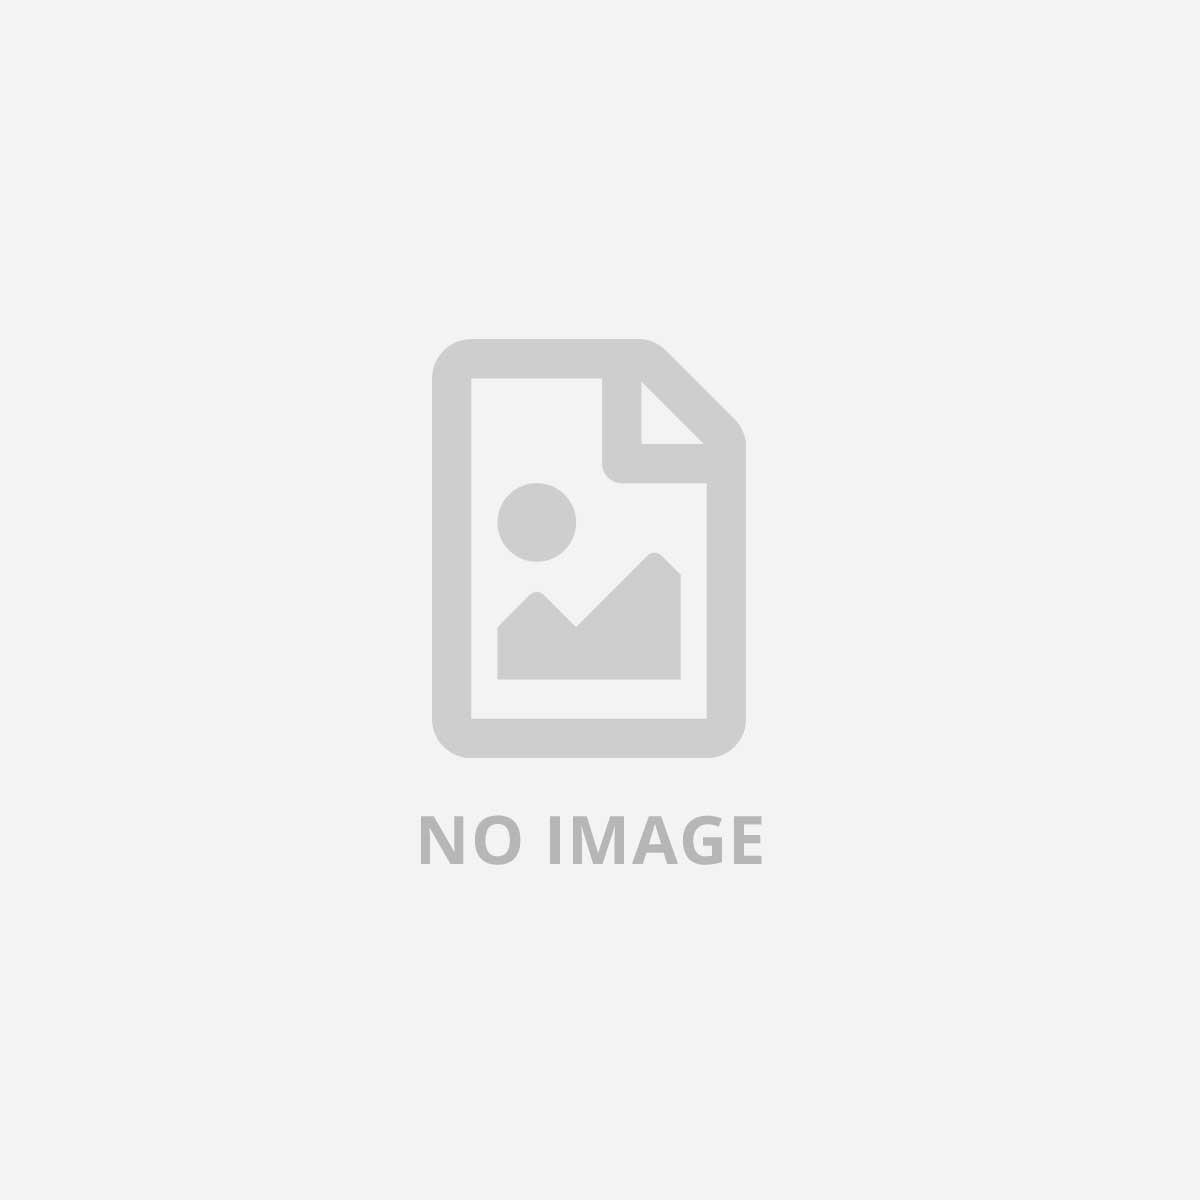 EPSON WORKFORCE WF-100W MAINTENANCE BOX